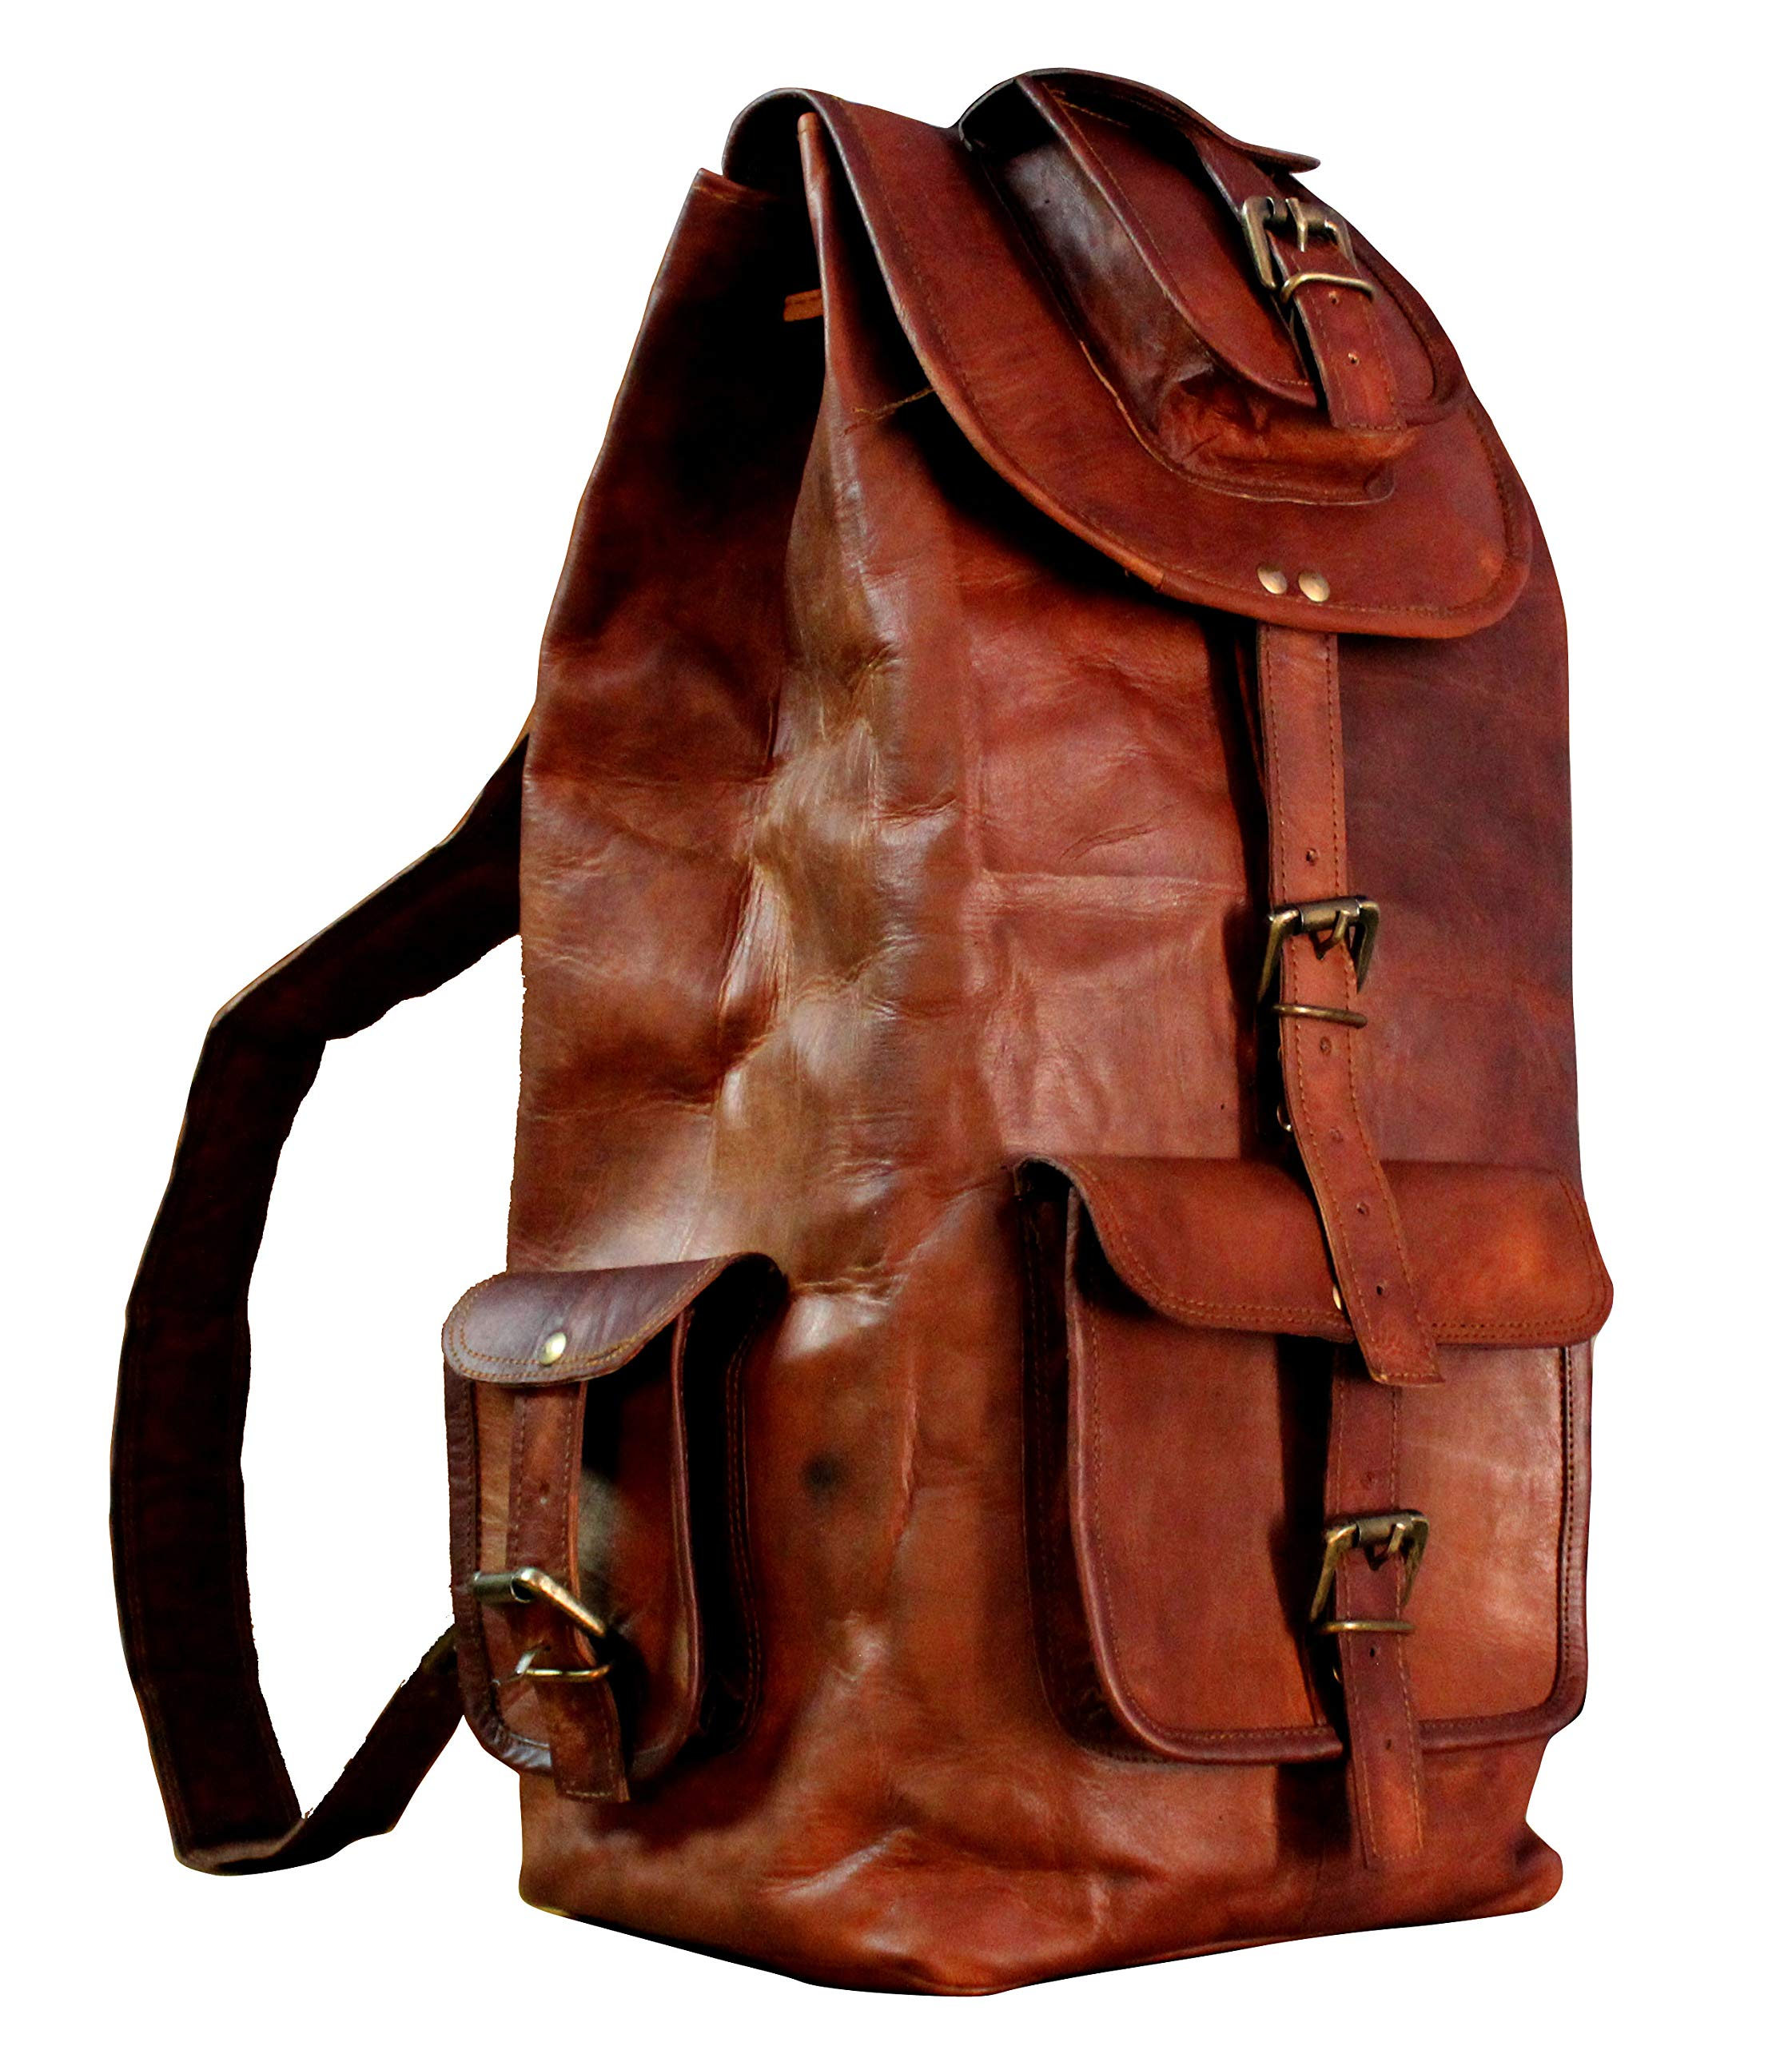 Leder_artesanía 50.8 cm 棕色复古皮革学院背包笔记本电脑邮差包帆布背包,男式女式